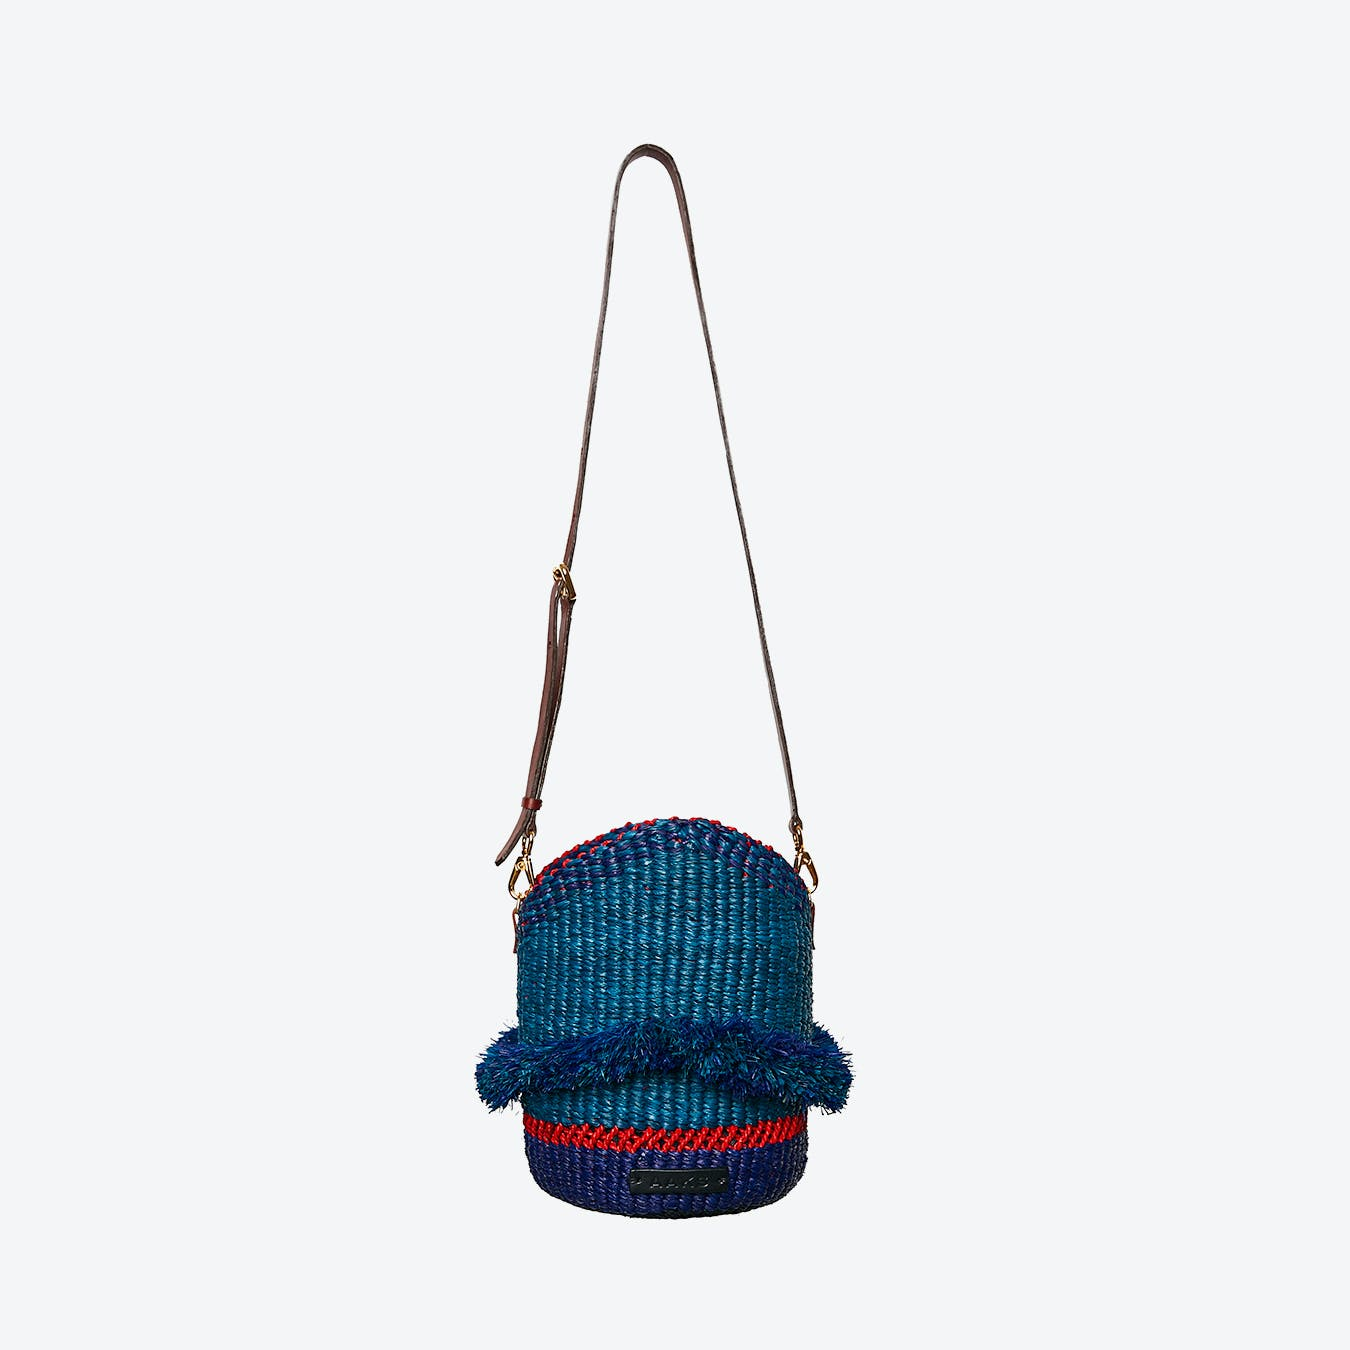 Belle Ruffle Bag